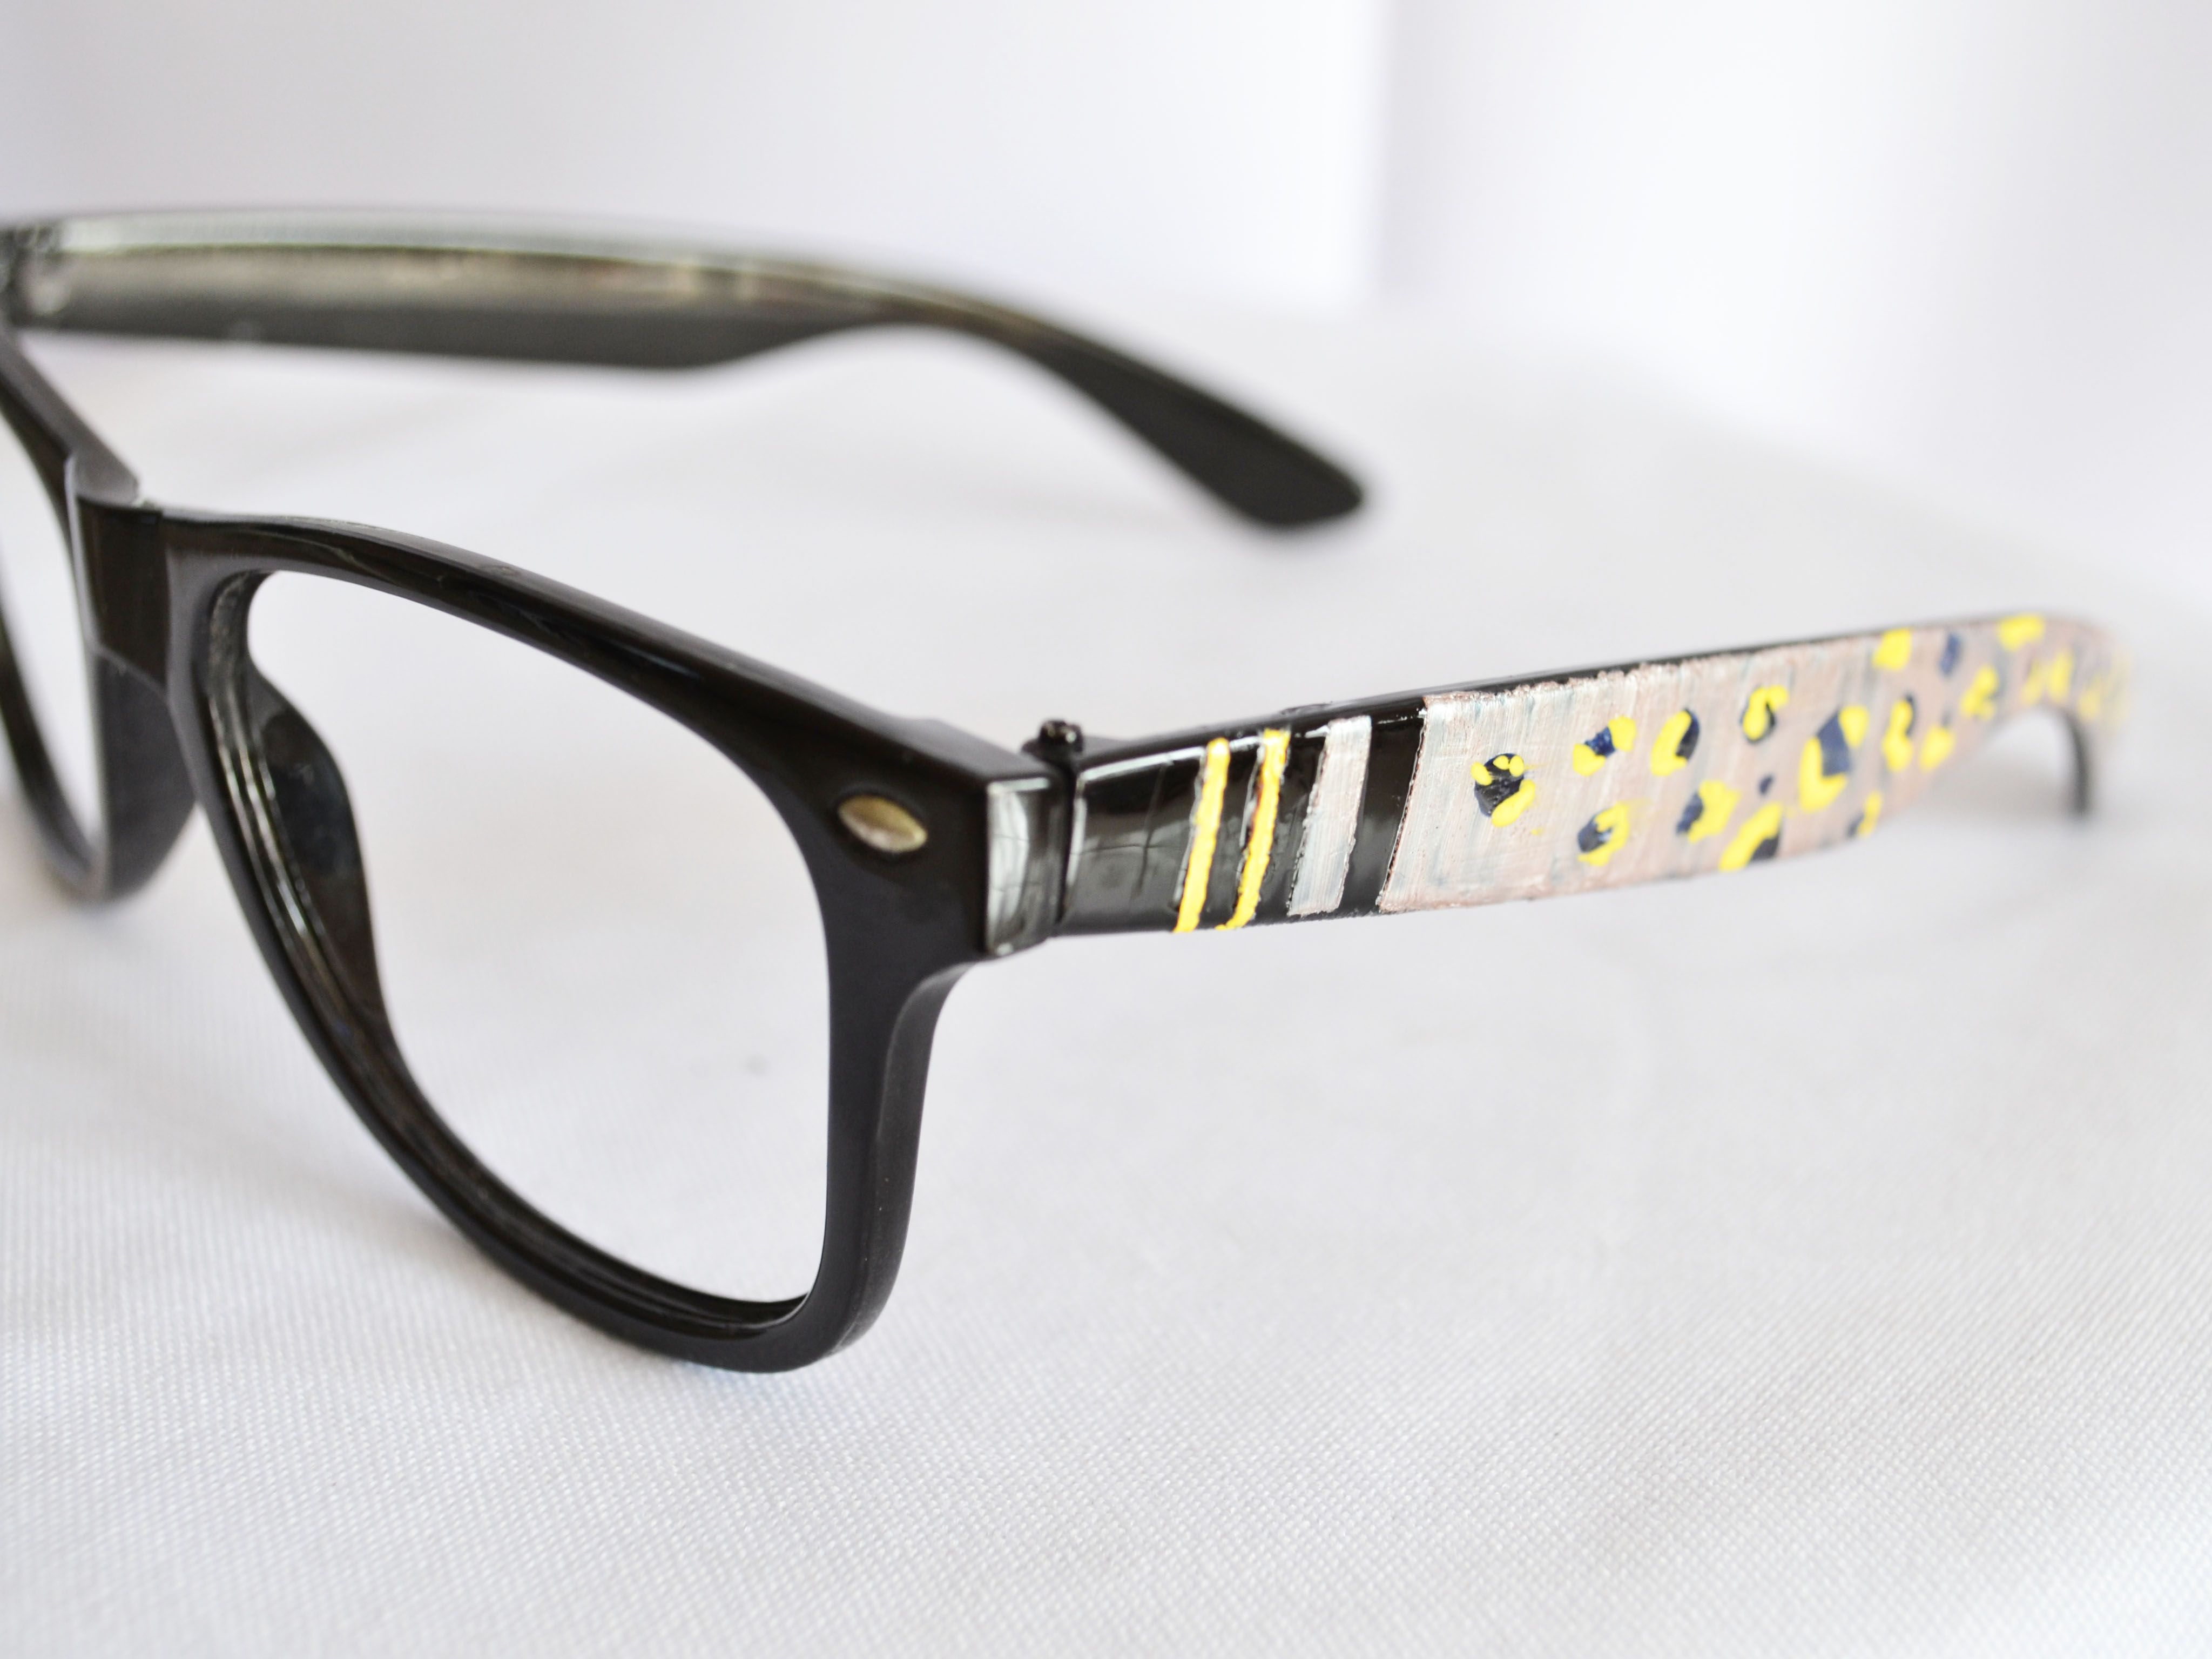 f0b484bd24 How to Paint Plastic Eyeglass Frames -- via wikiHow.com